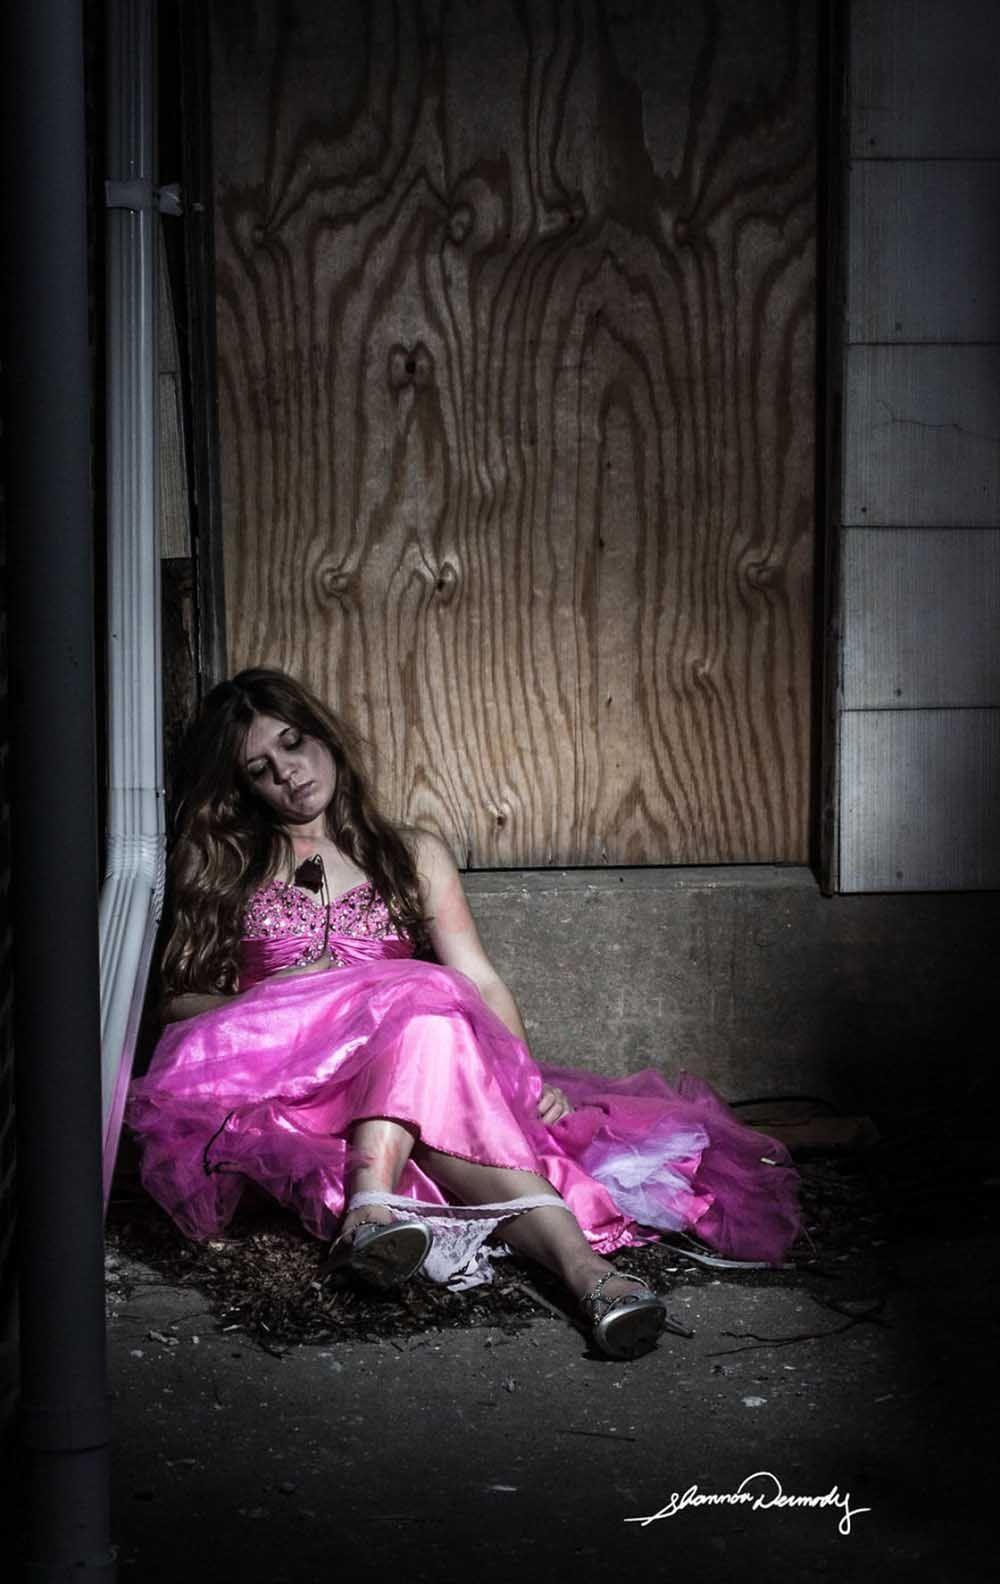 disney-princesses-real-world-problems-shannon-dermody-1-590c8953ebe2e-880-32f29b8fa8108ea531b7b698e78661bd.jpg